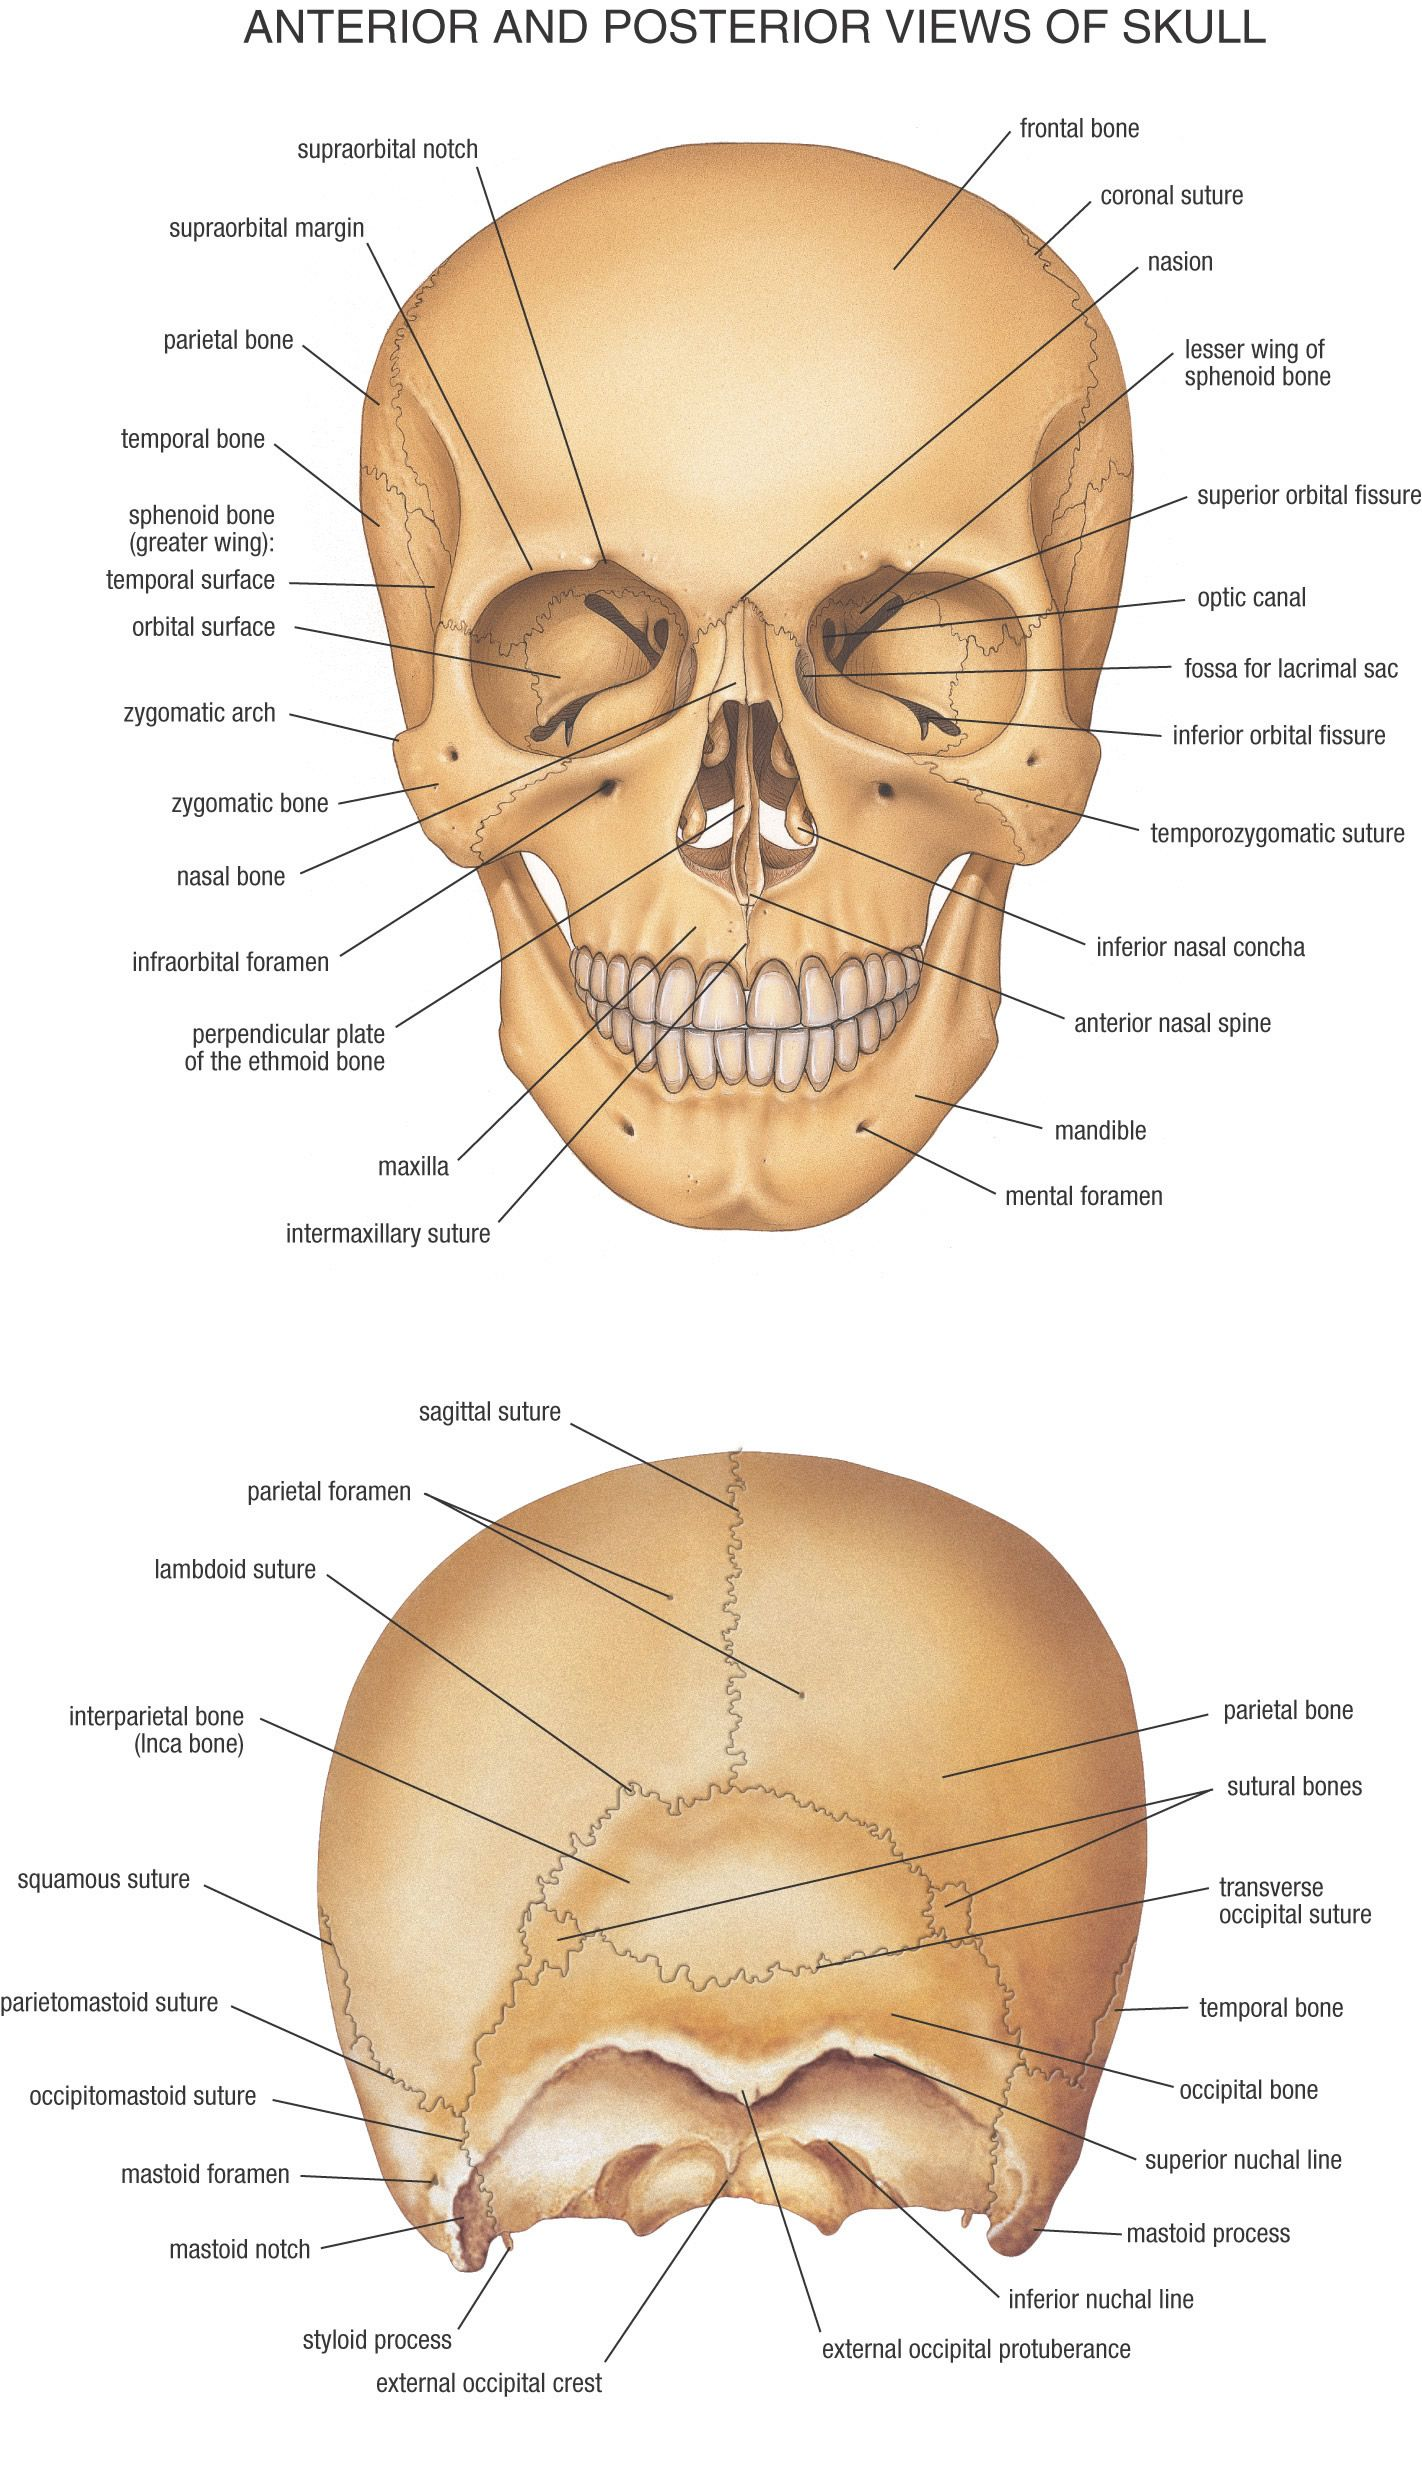 hb anatomy skull [ 1422 x 2490 Pixel ]